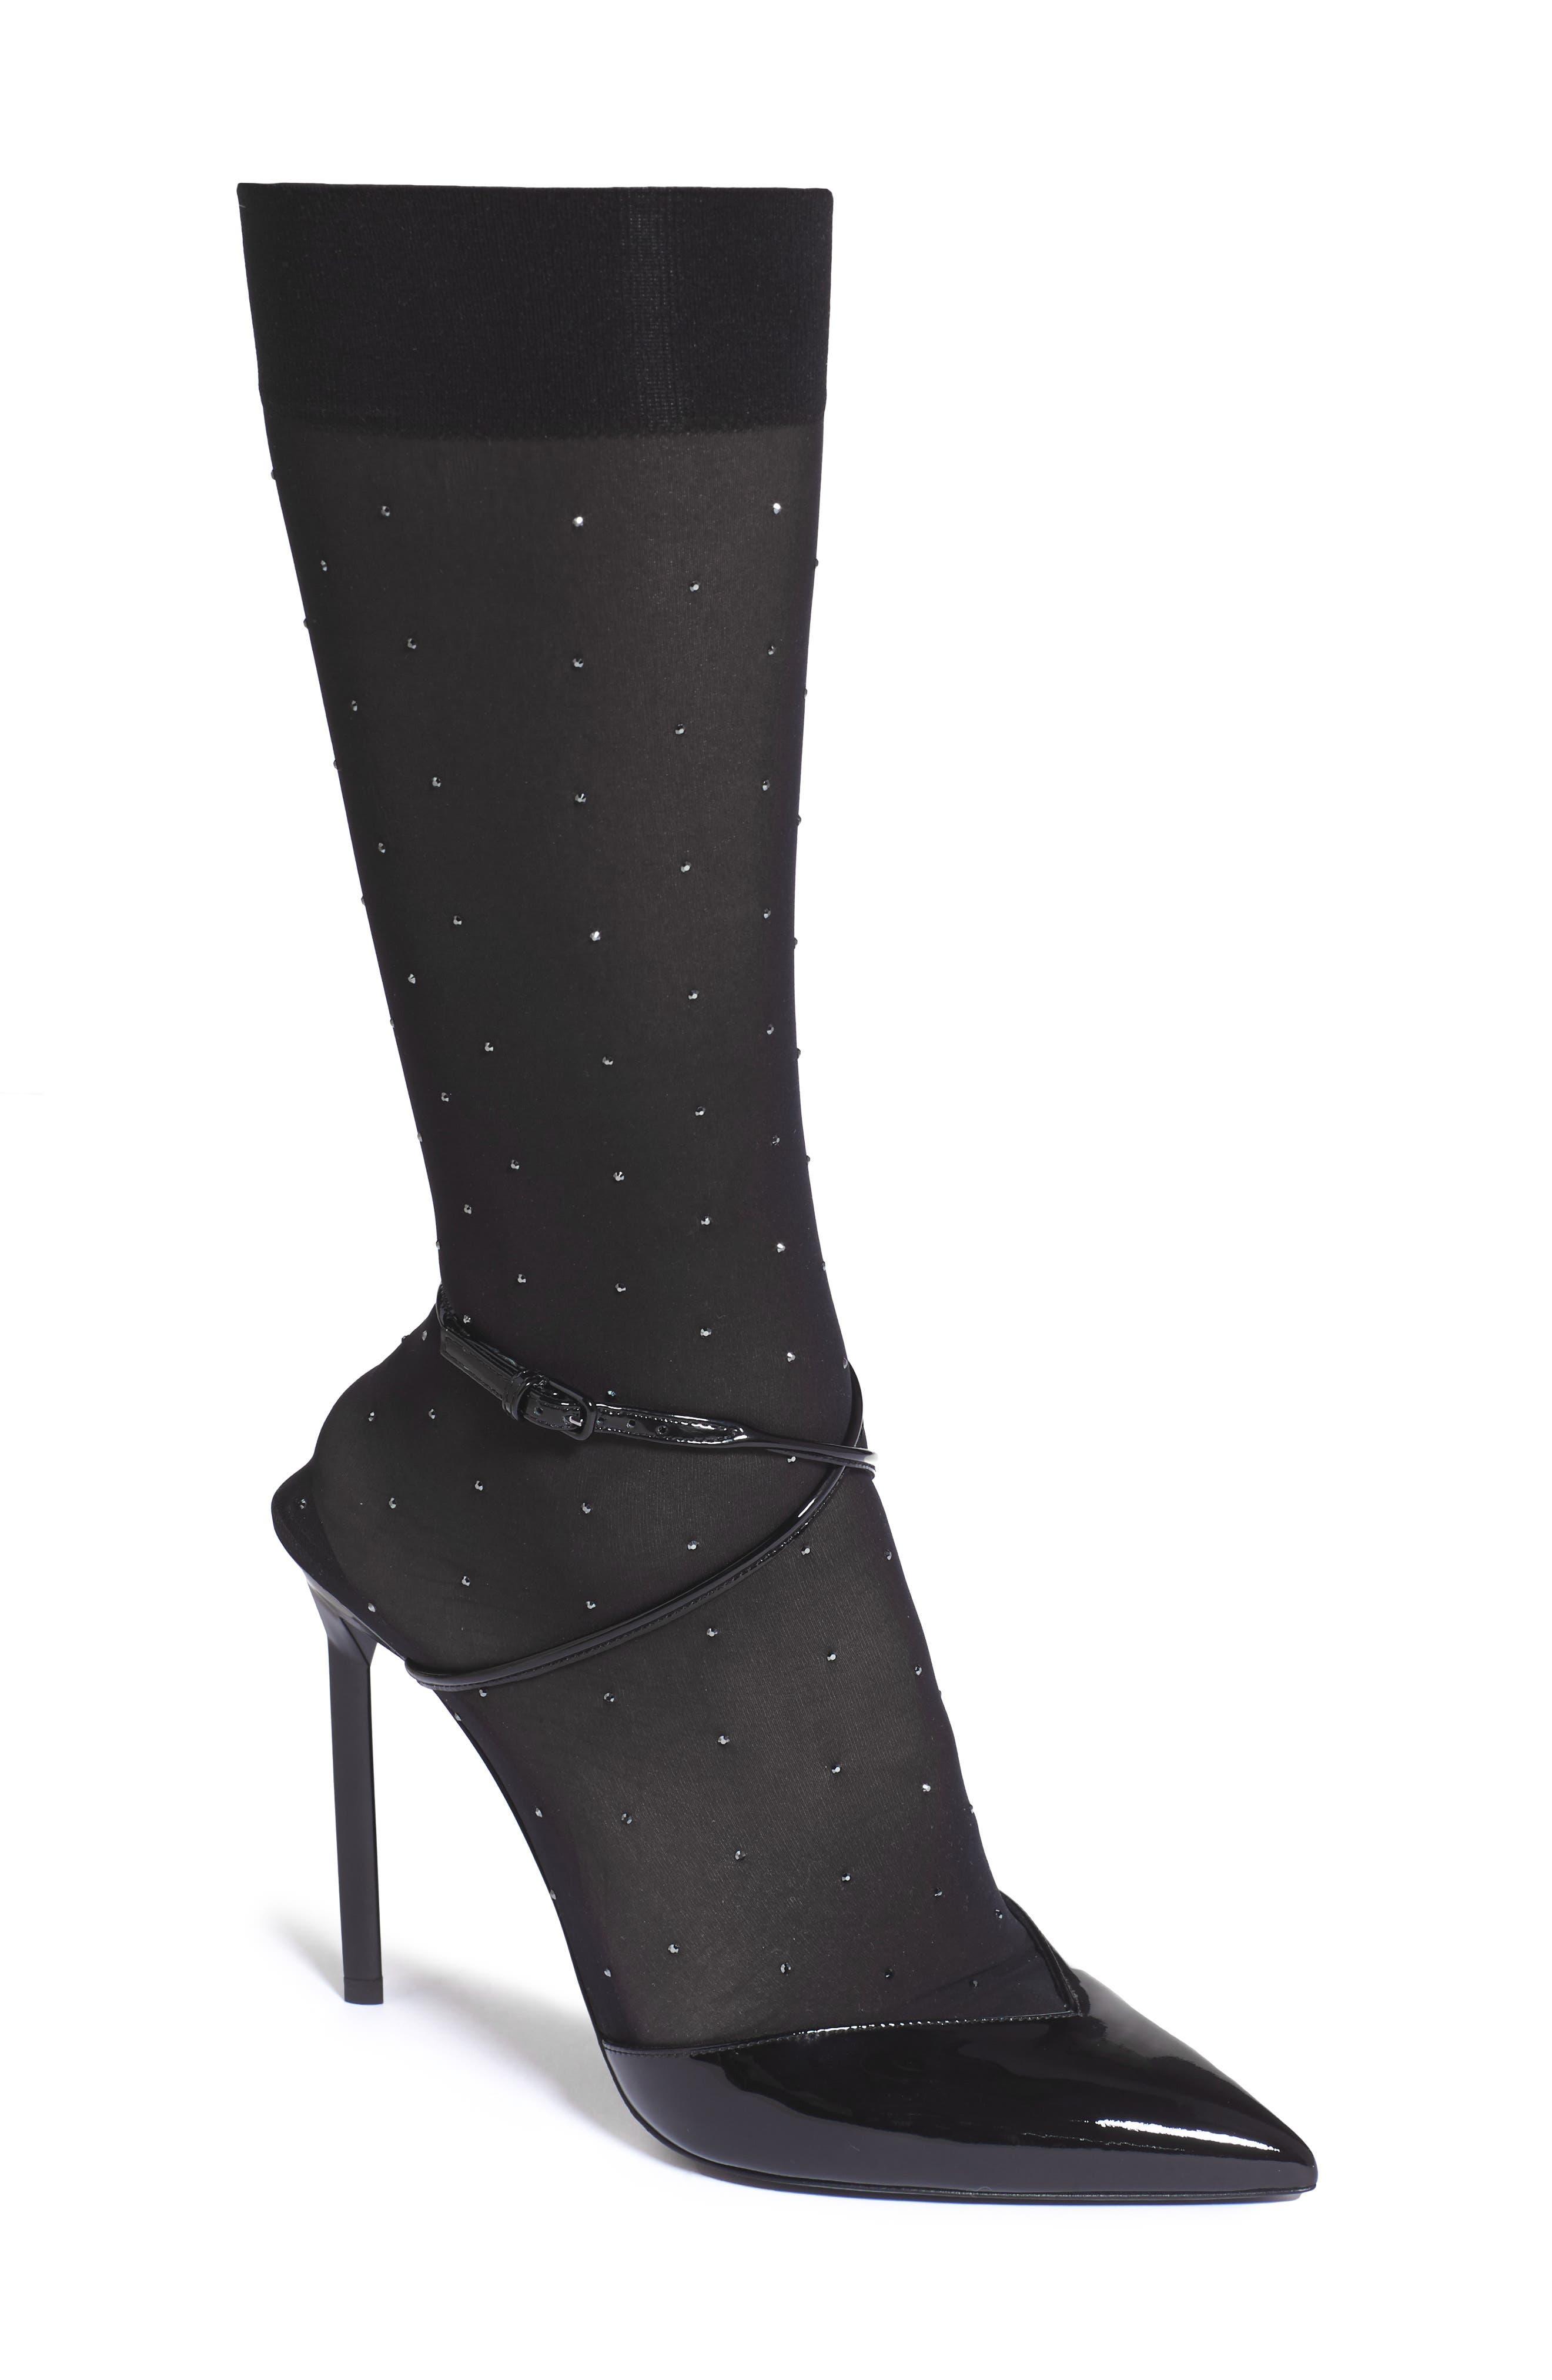 Alternate Image 1 Selected - Saint Laurent Edie Sock Pump (Women)